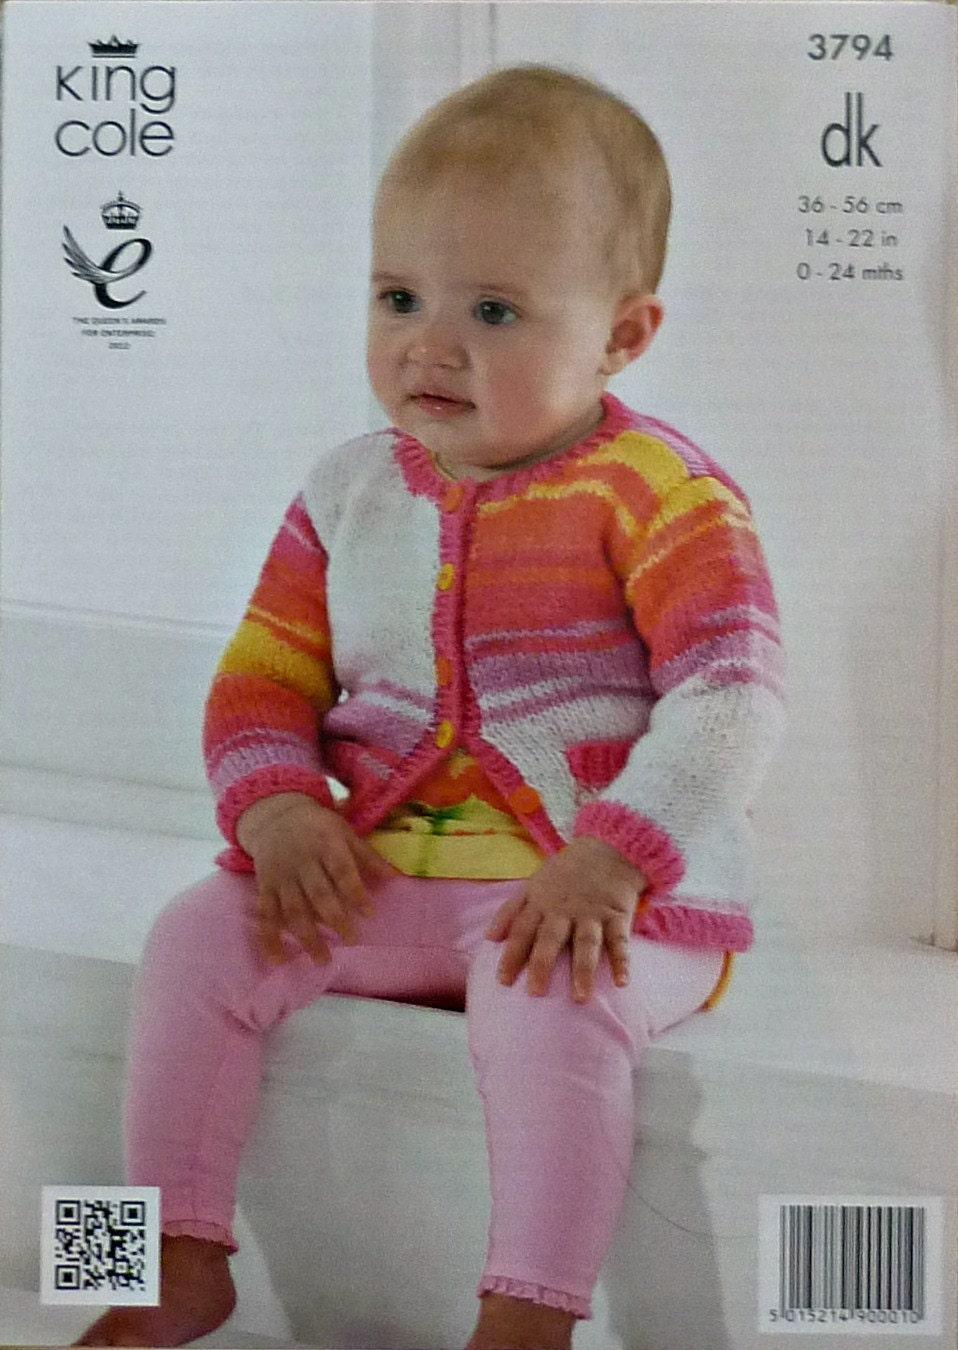 Baby Knitting Pattern K3794 Babies Long Sleeve Round Neck Cardigan with Pocke...